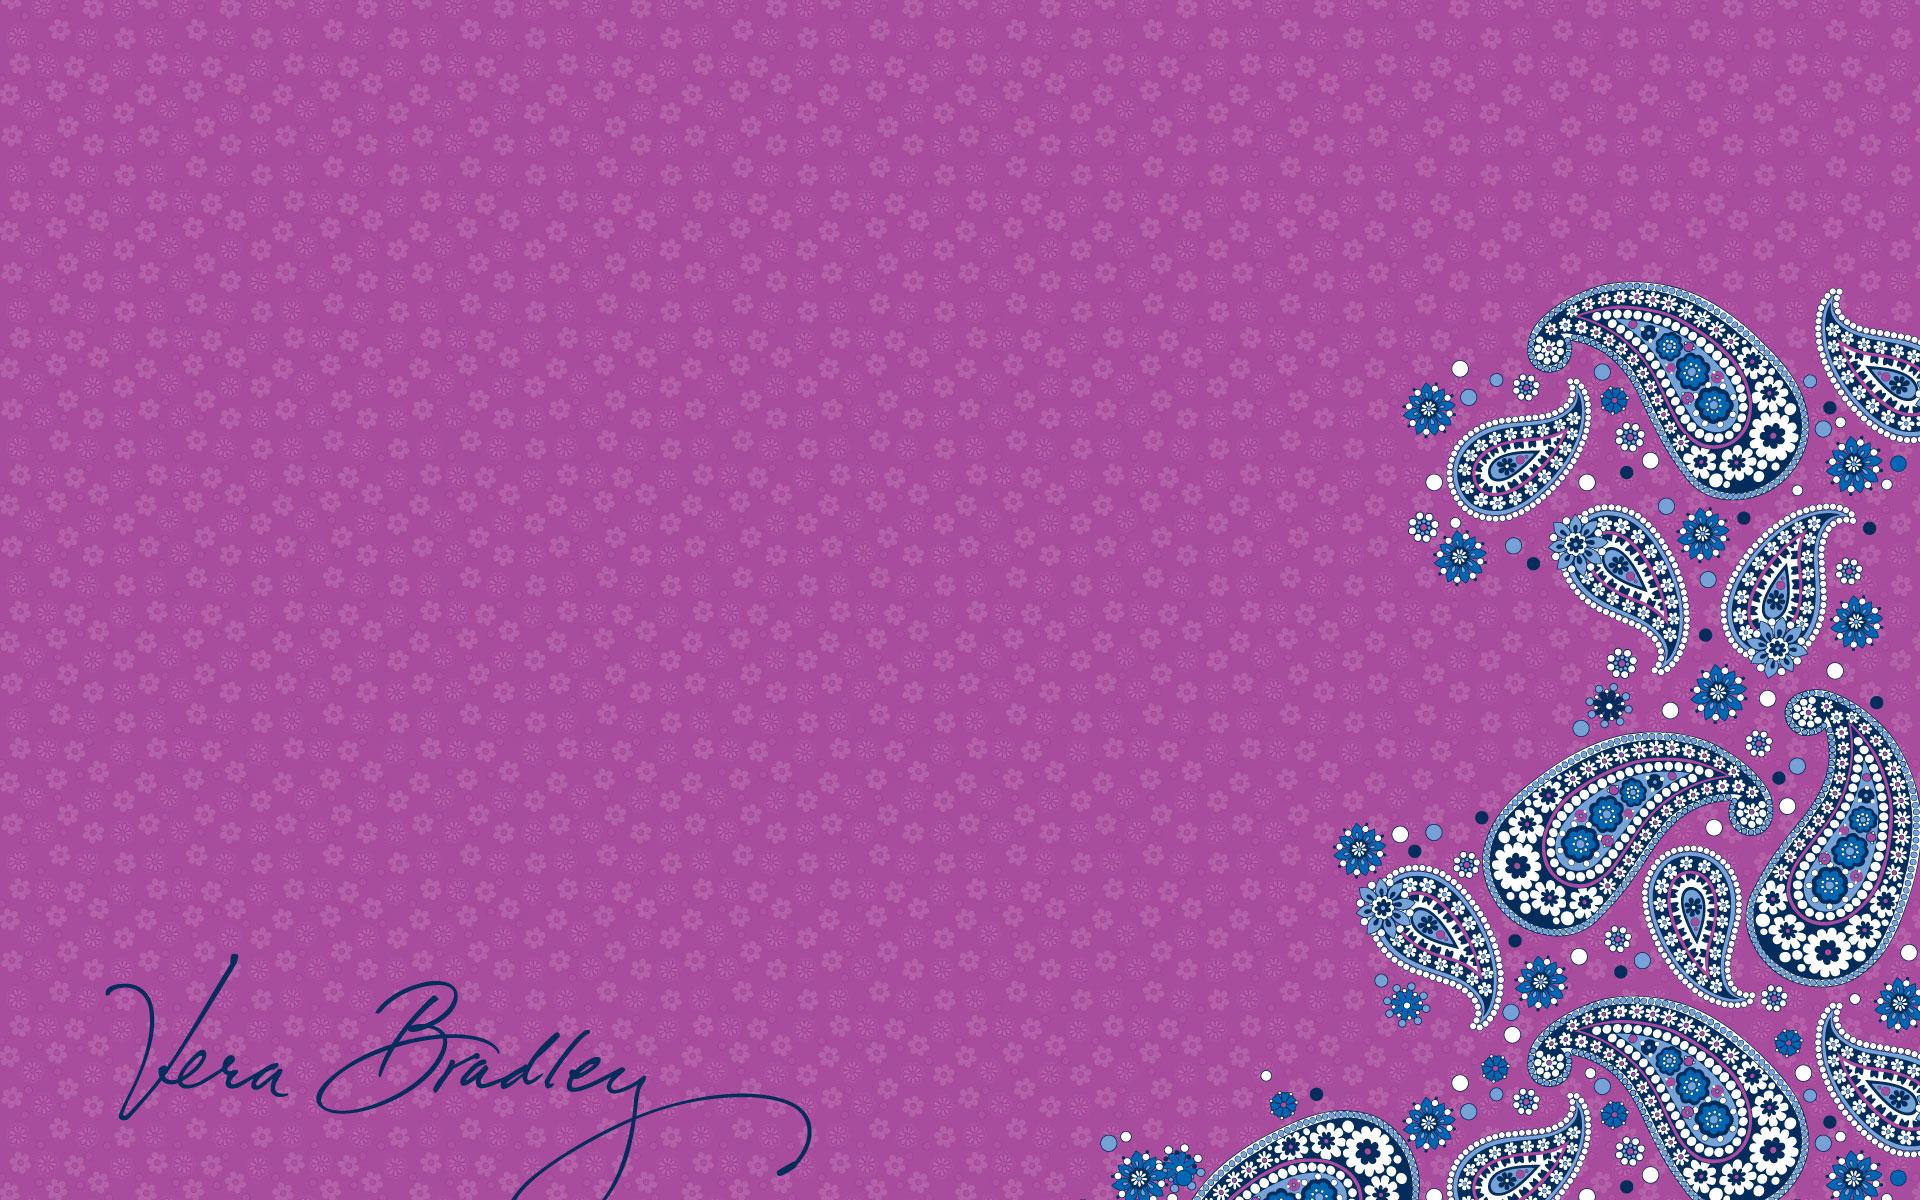 Vera Bradley Images VB Wallpapers HD Wallpaper And